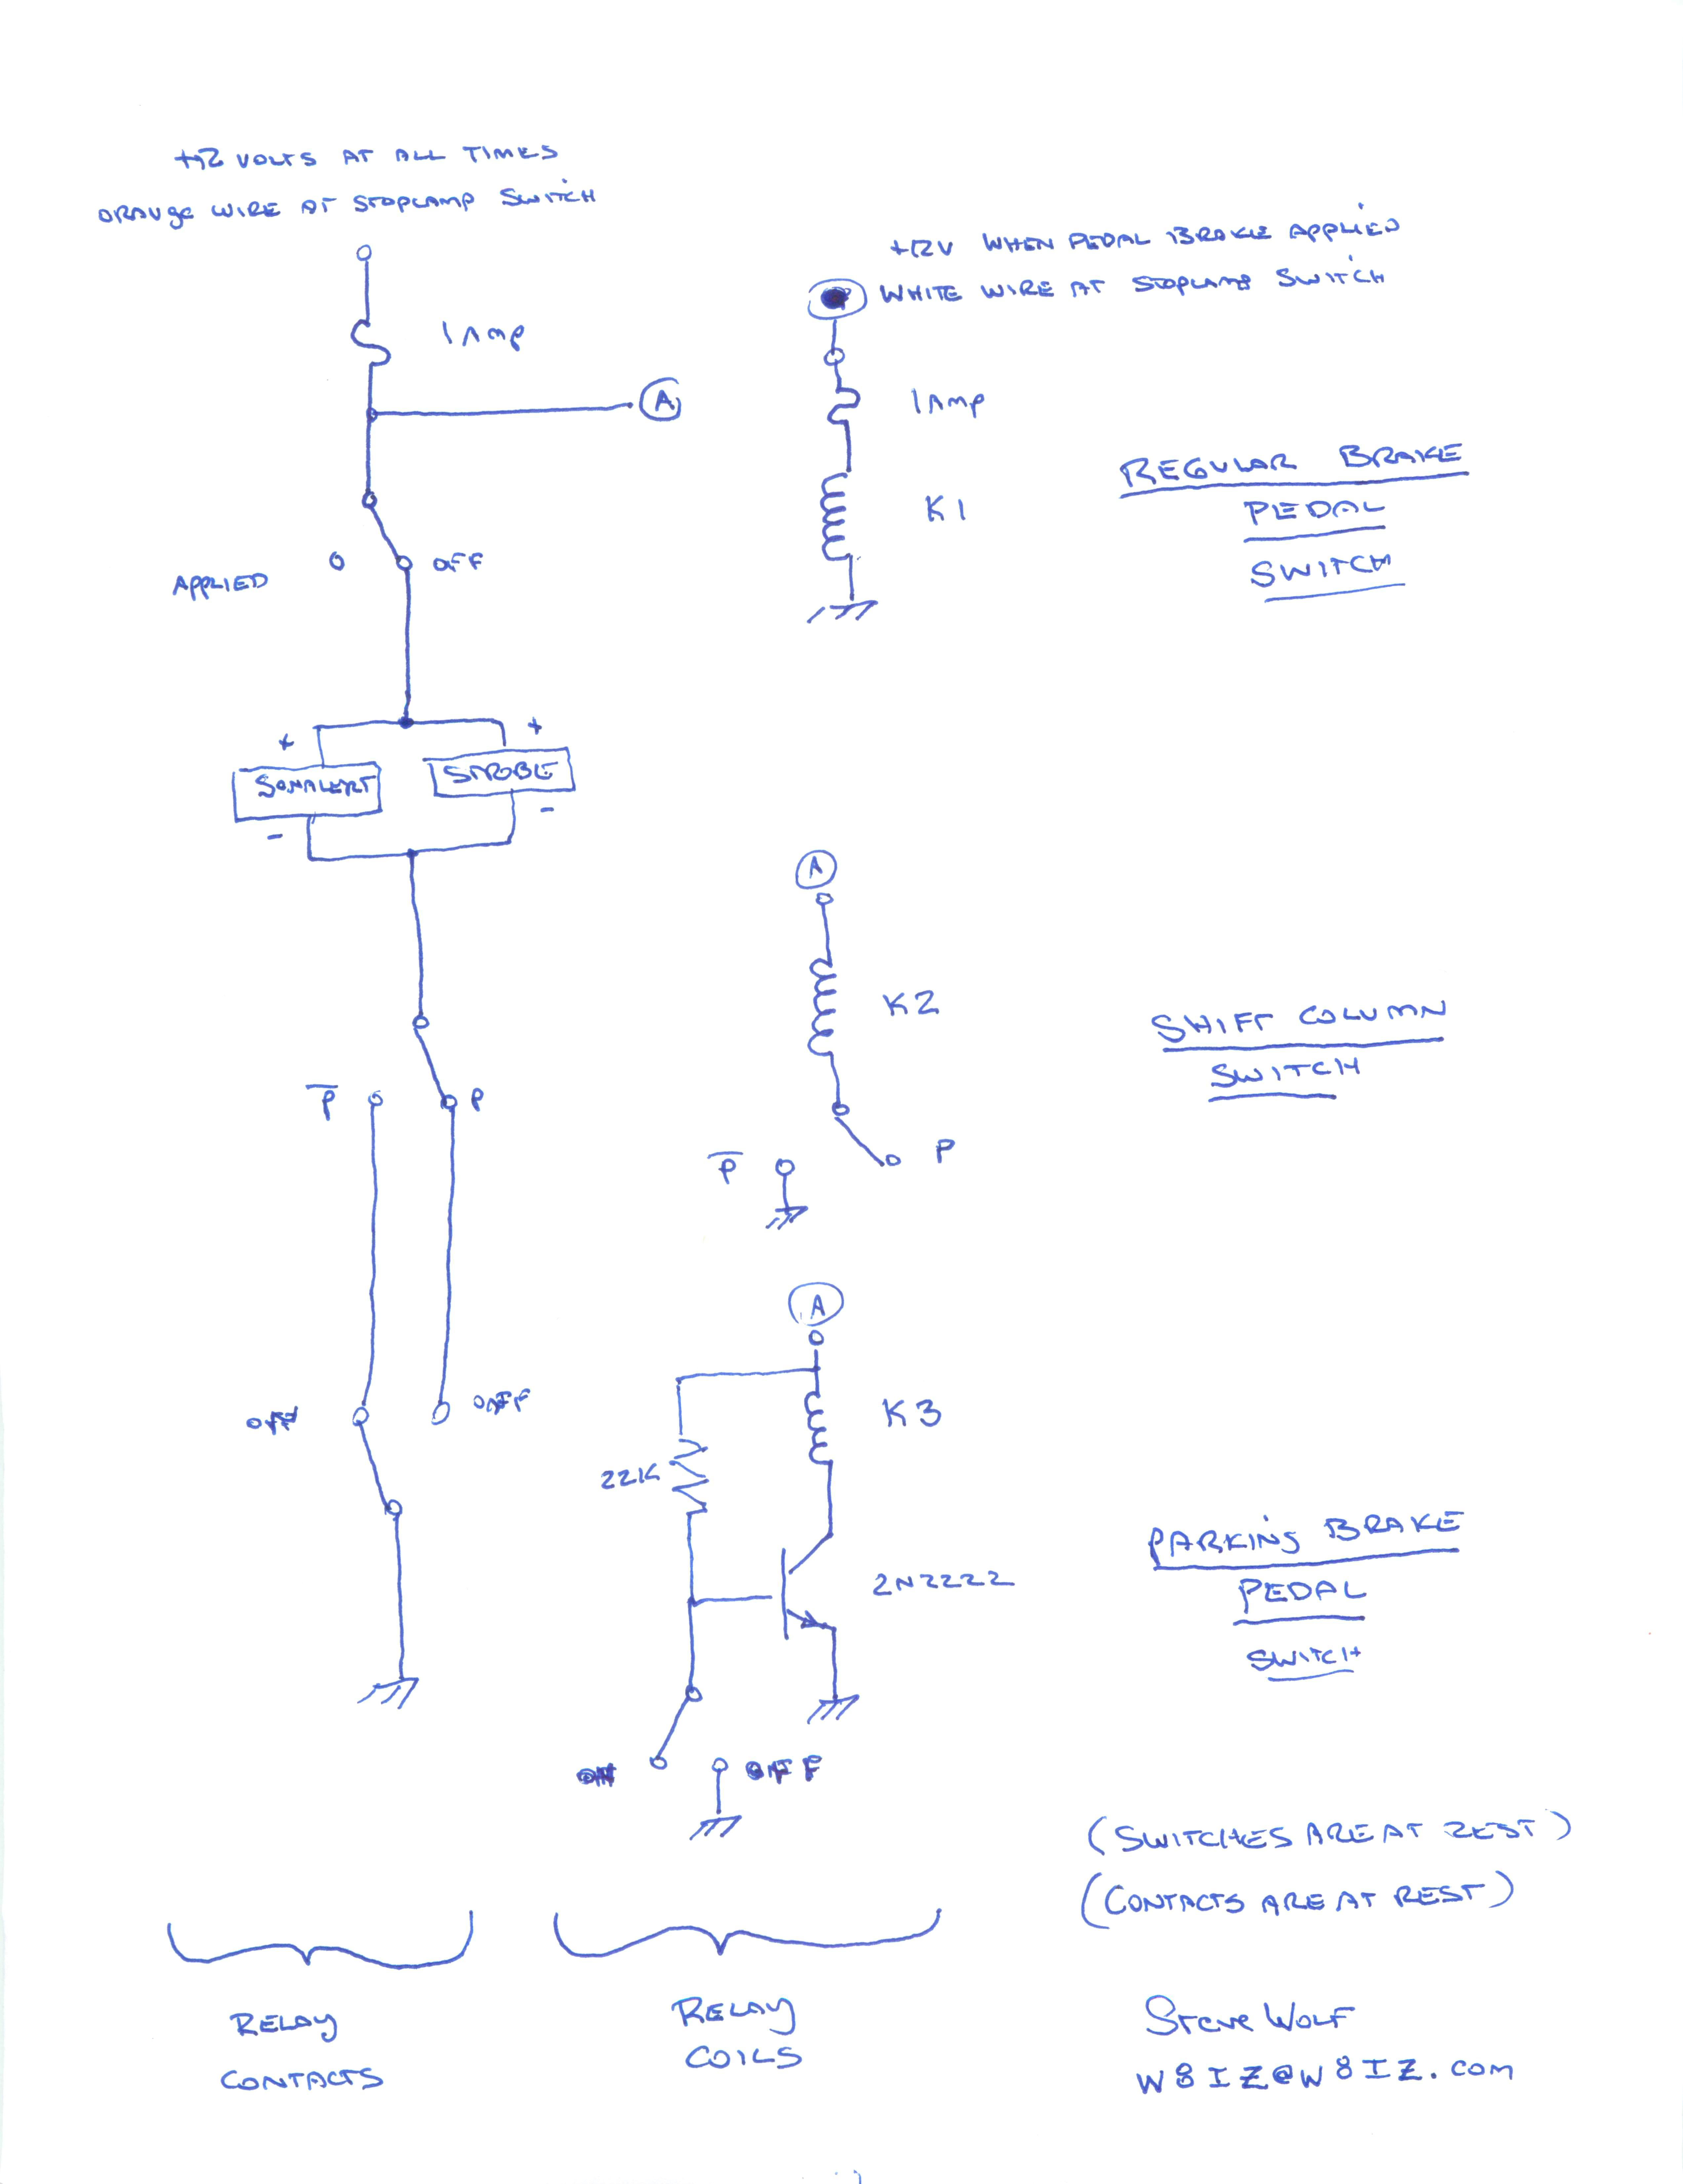 Air Brake Foot Valve Diagram Autopark Block Diagram For The Version Iii Autopark System Again The